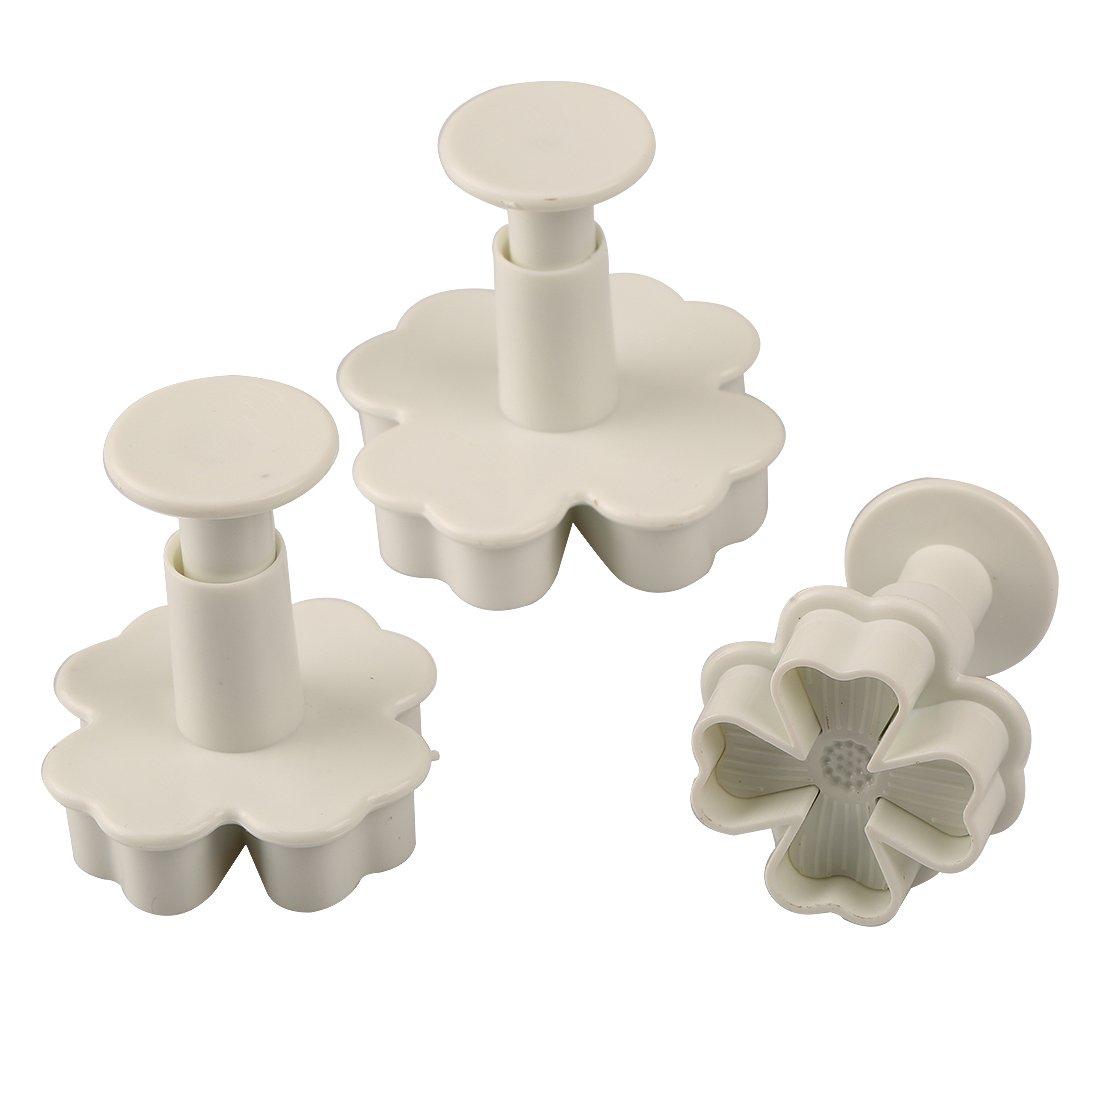 New 3pcs/set Flower Shape Cake Sugarcraft Plunger Decoration Diy Tool Mold Kitchen Accessories by Joylive (Image #1)